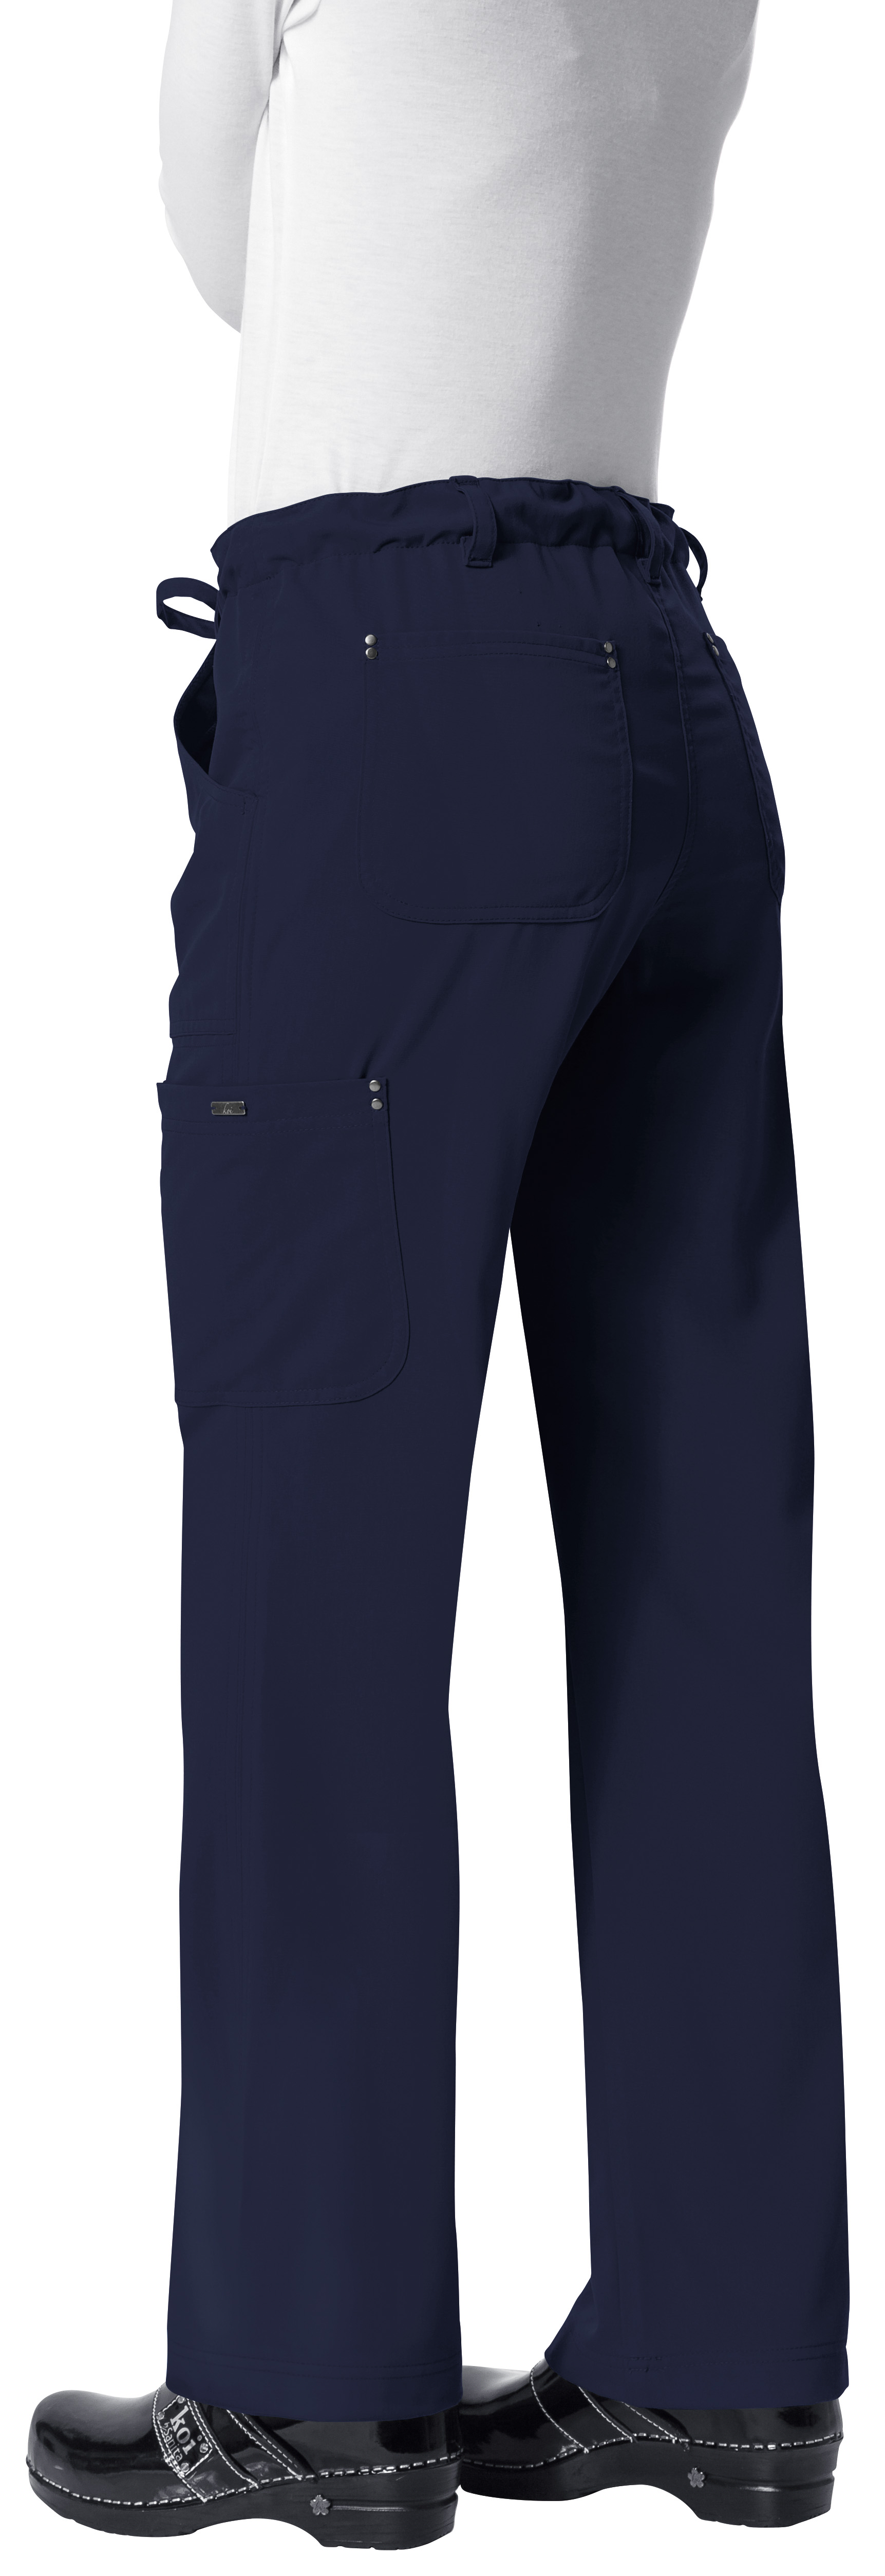 9b2f1a2bc17 koi Basics Laurie Pant — Incredibly Comfortable Uniforms